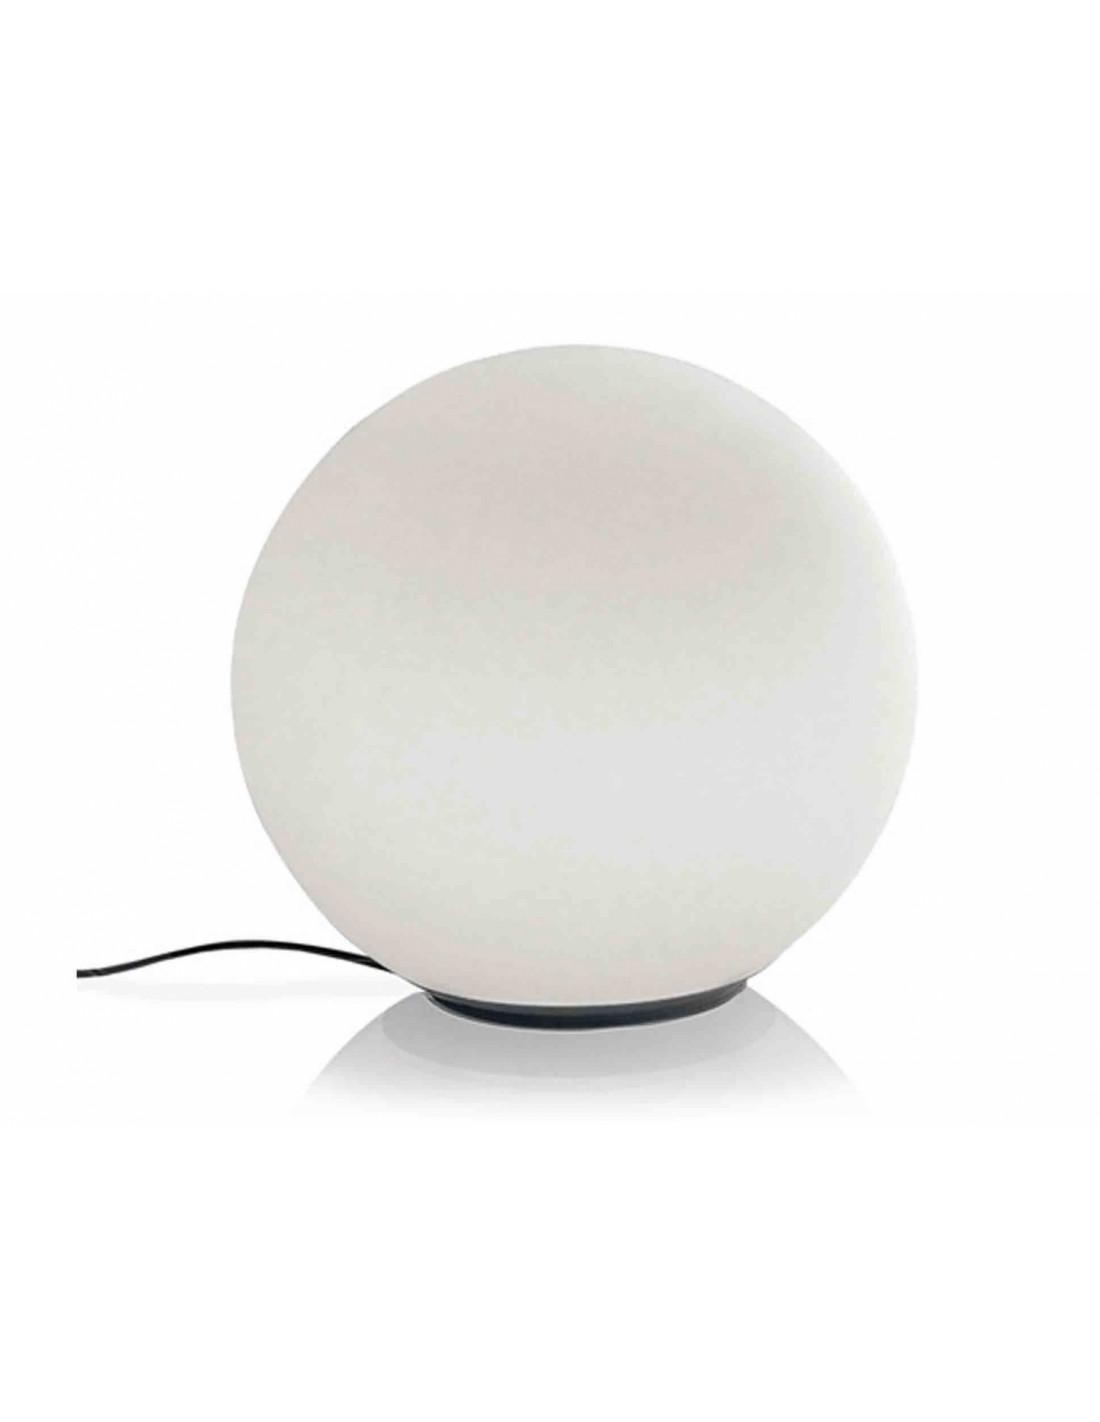 lampe dioscuri artemide lampe poser. Black Bedroom Furniture Sets. Home Design Ideas